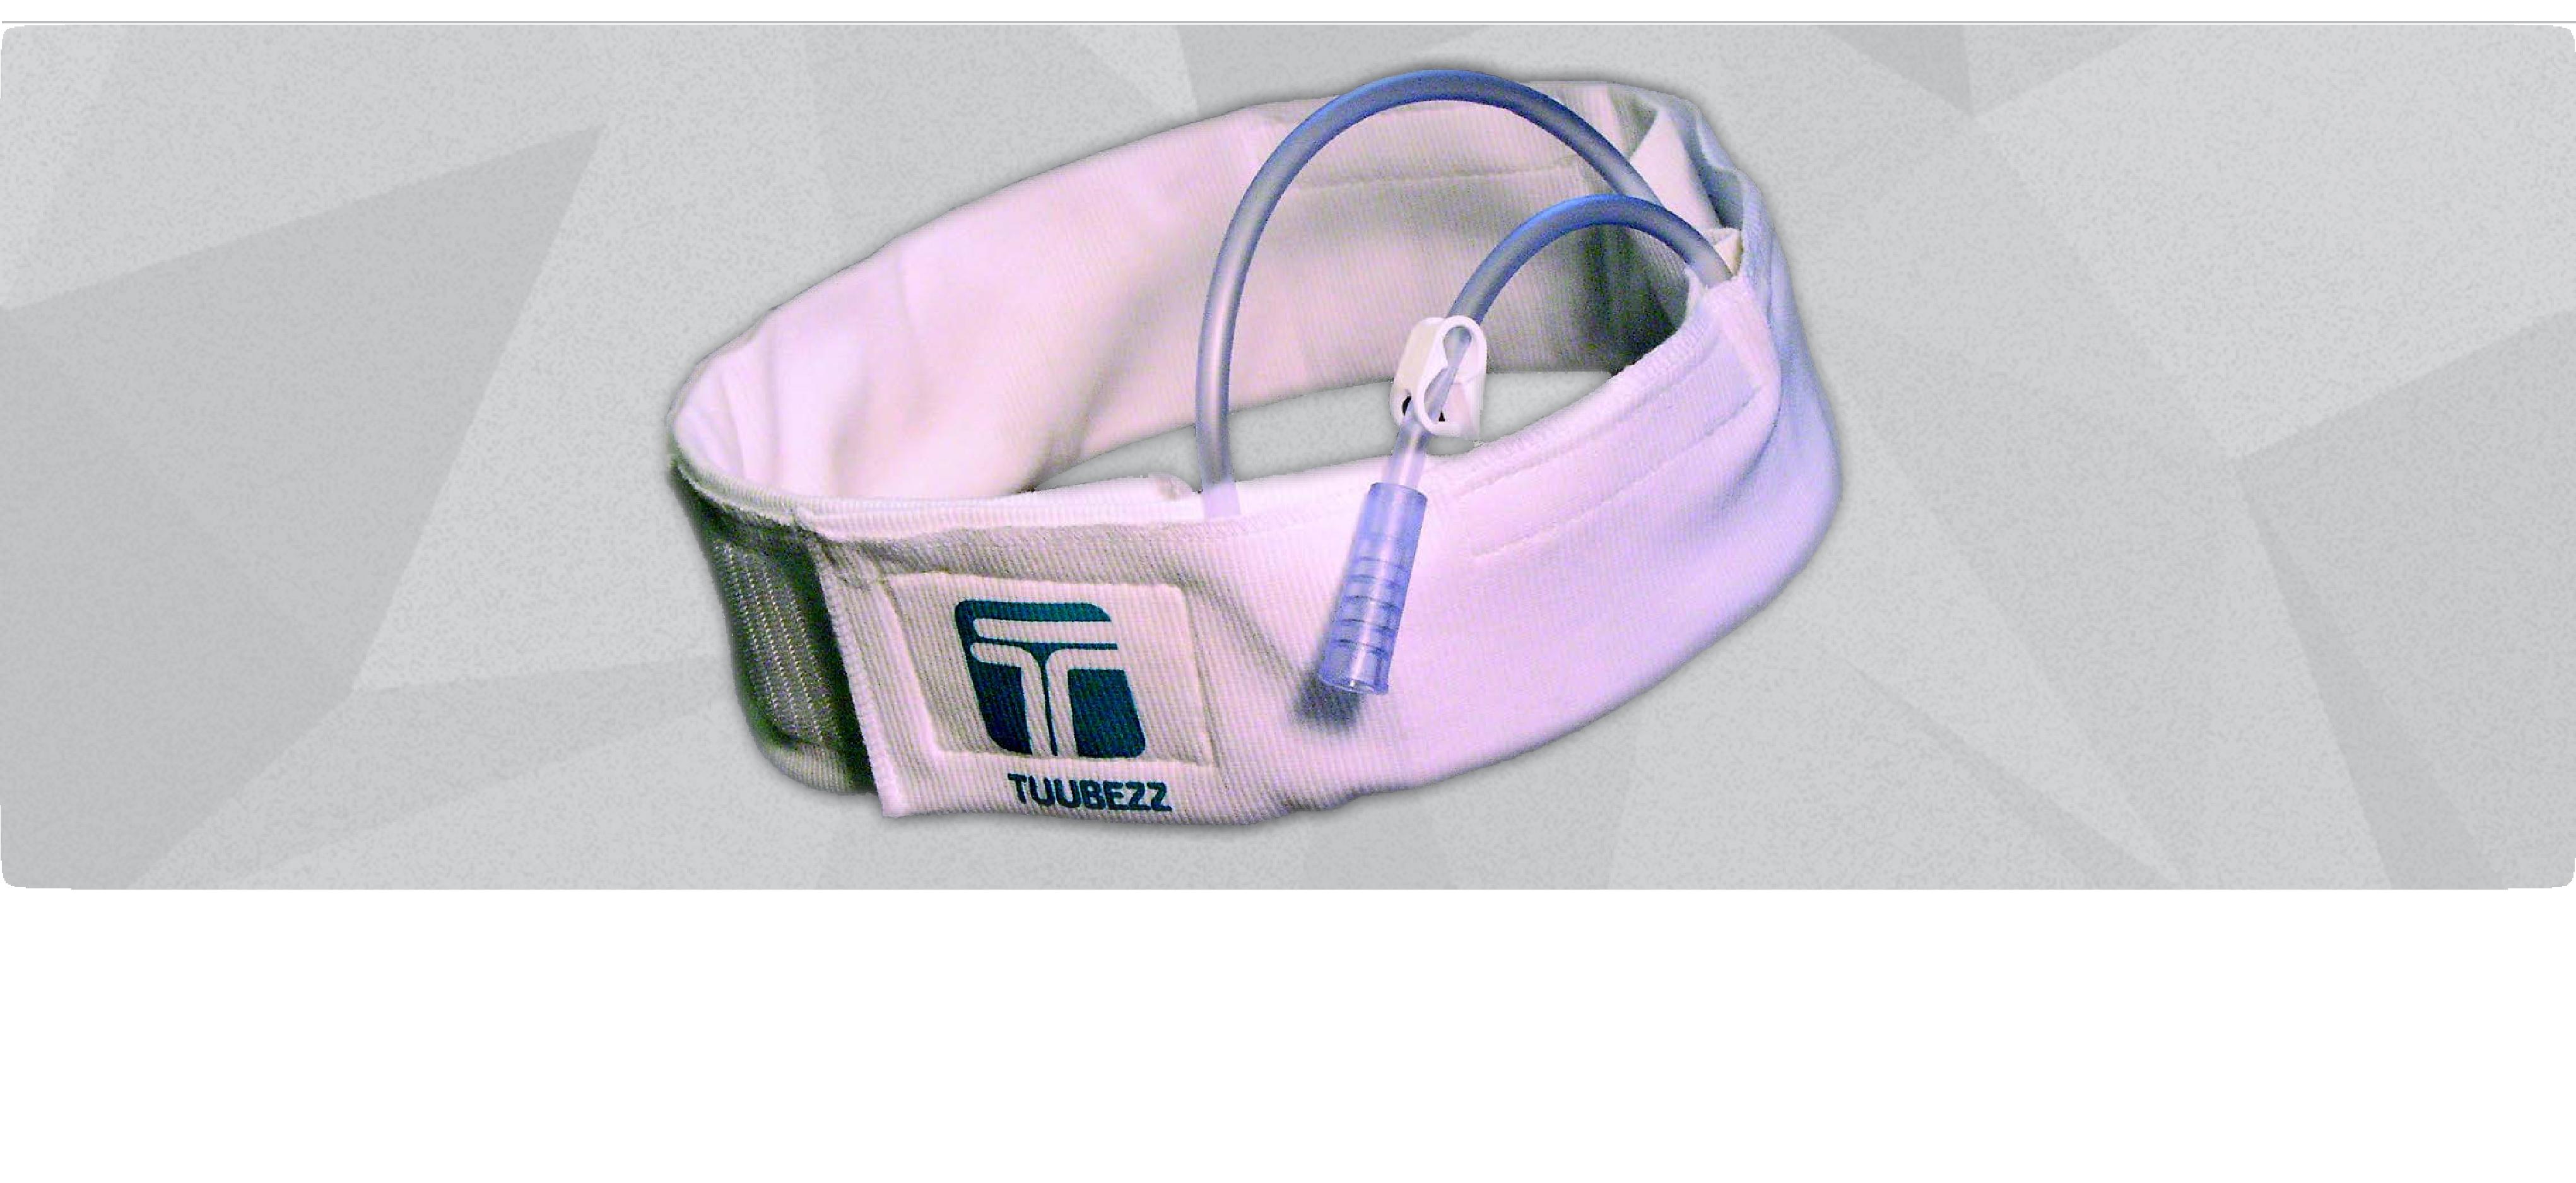 Tuubezz belt